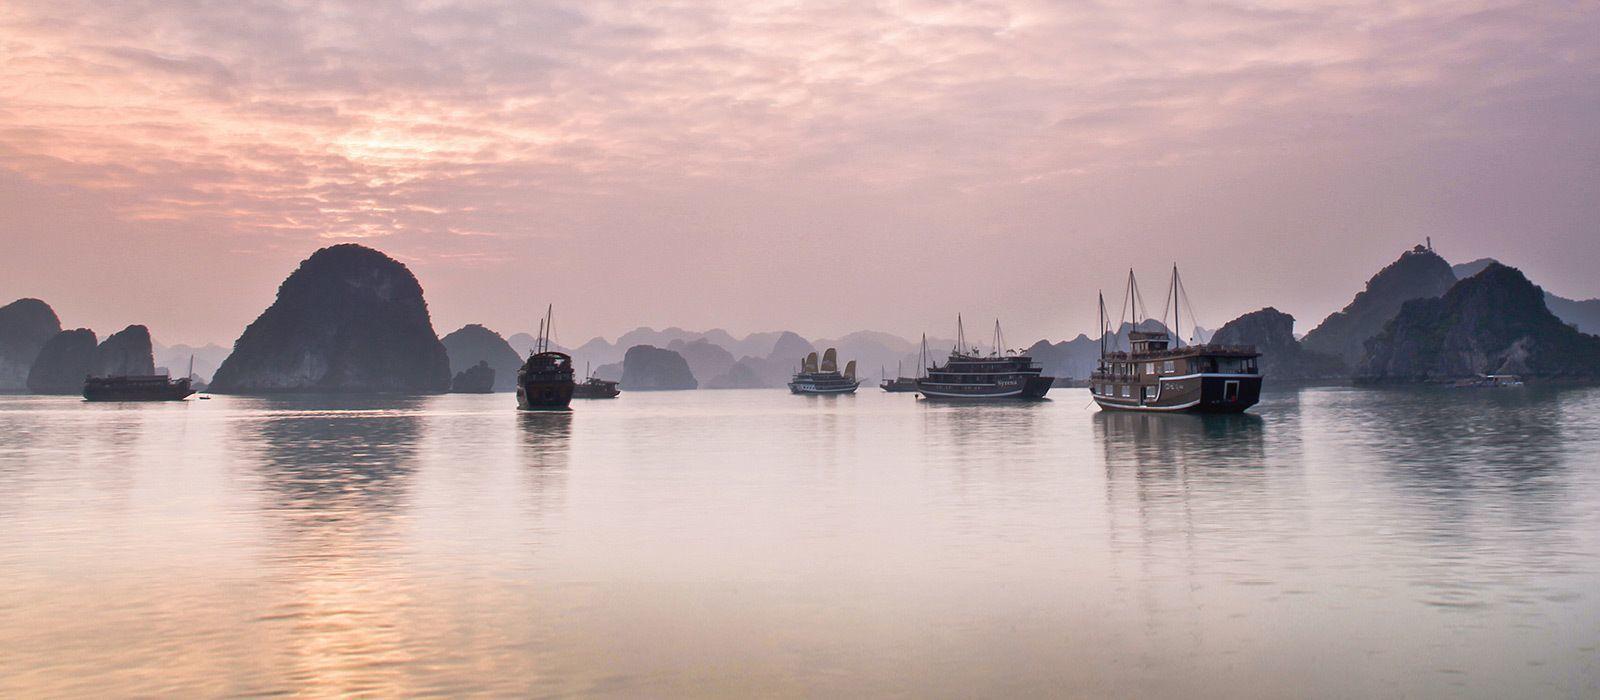 A Grand Journey through South East Asia Tour Trip 4